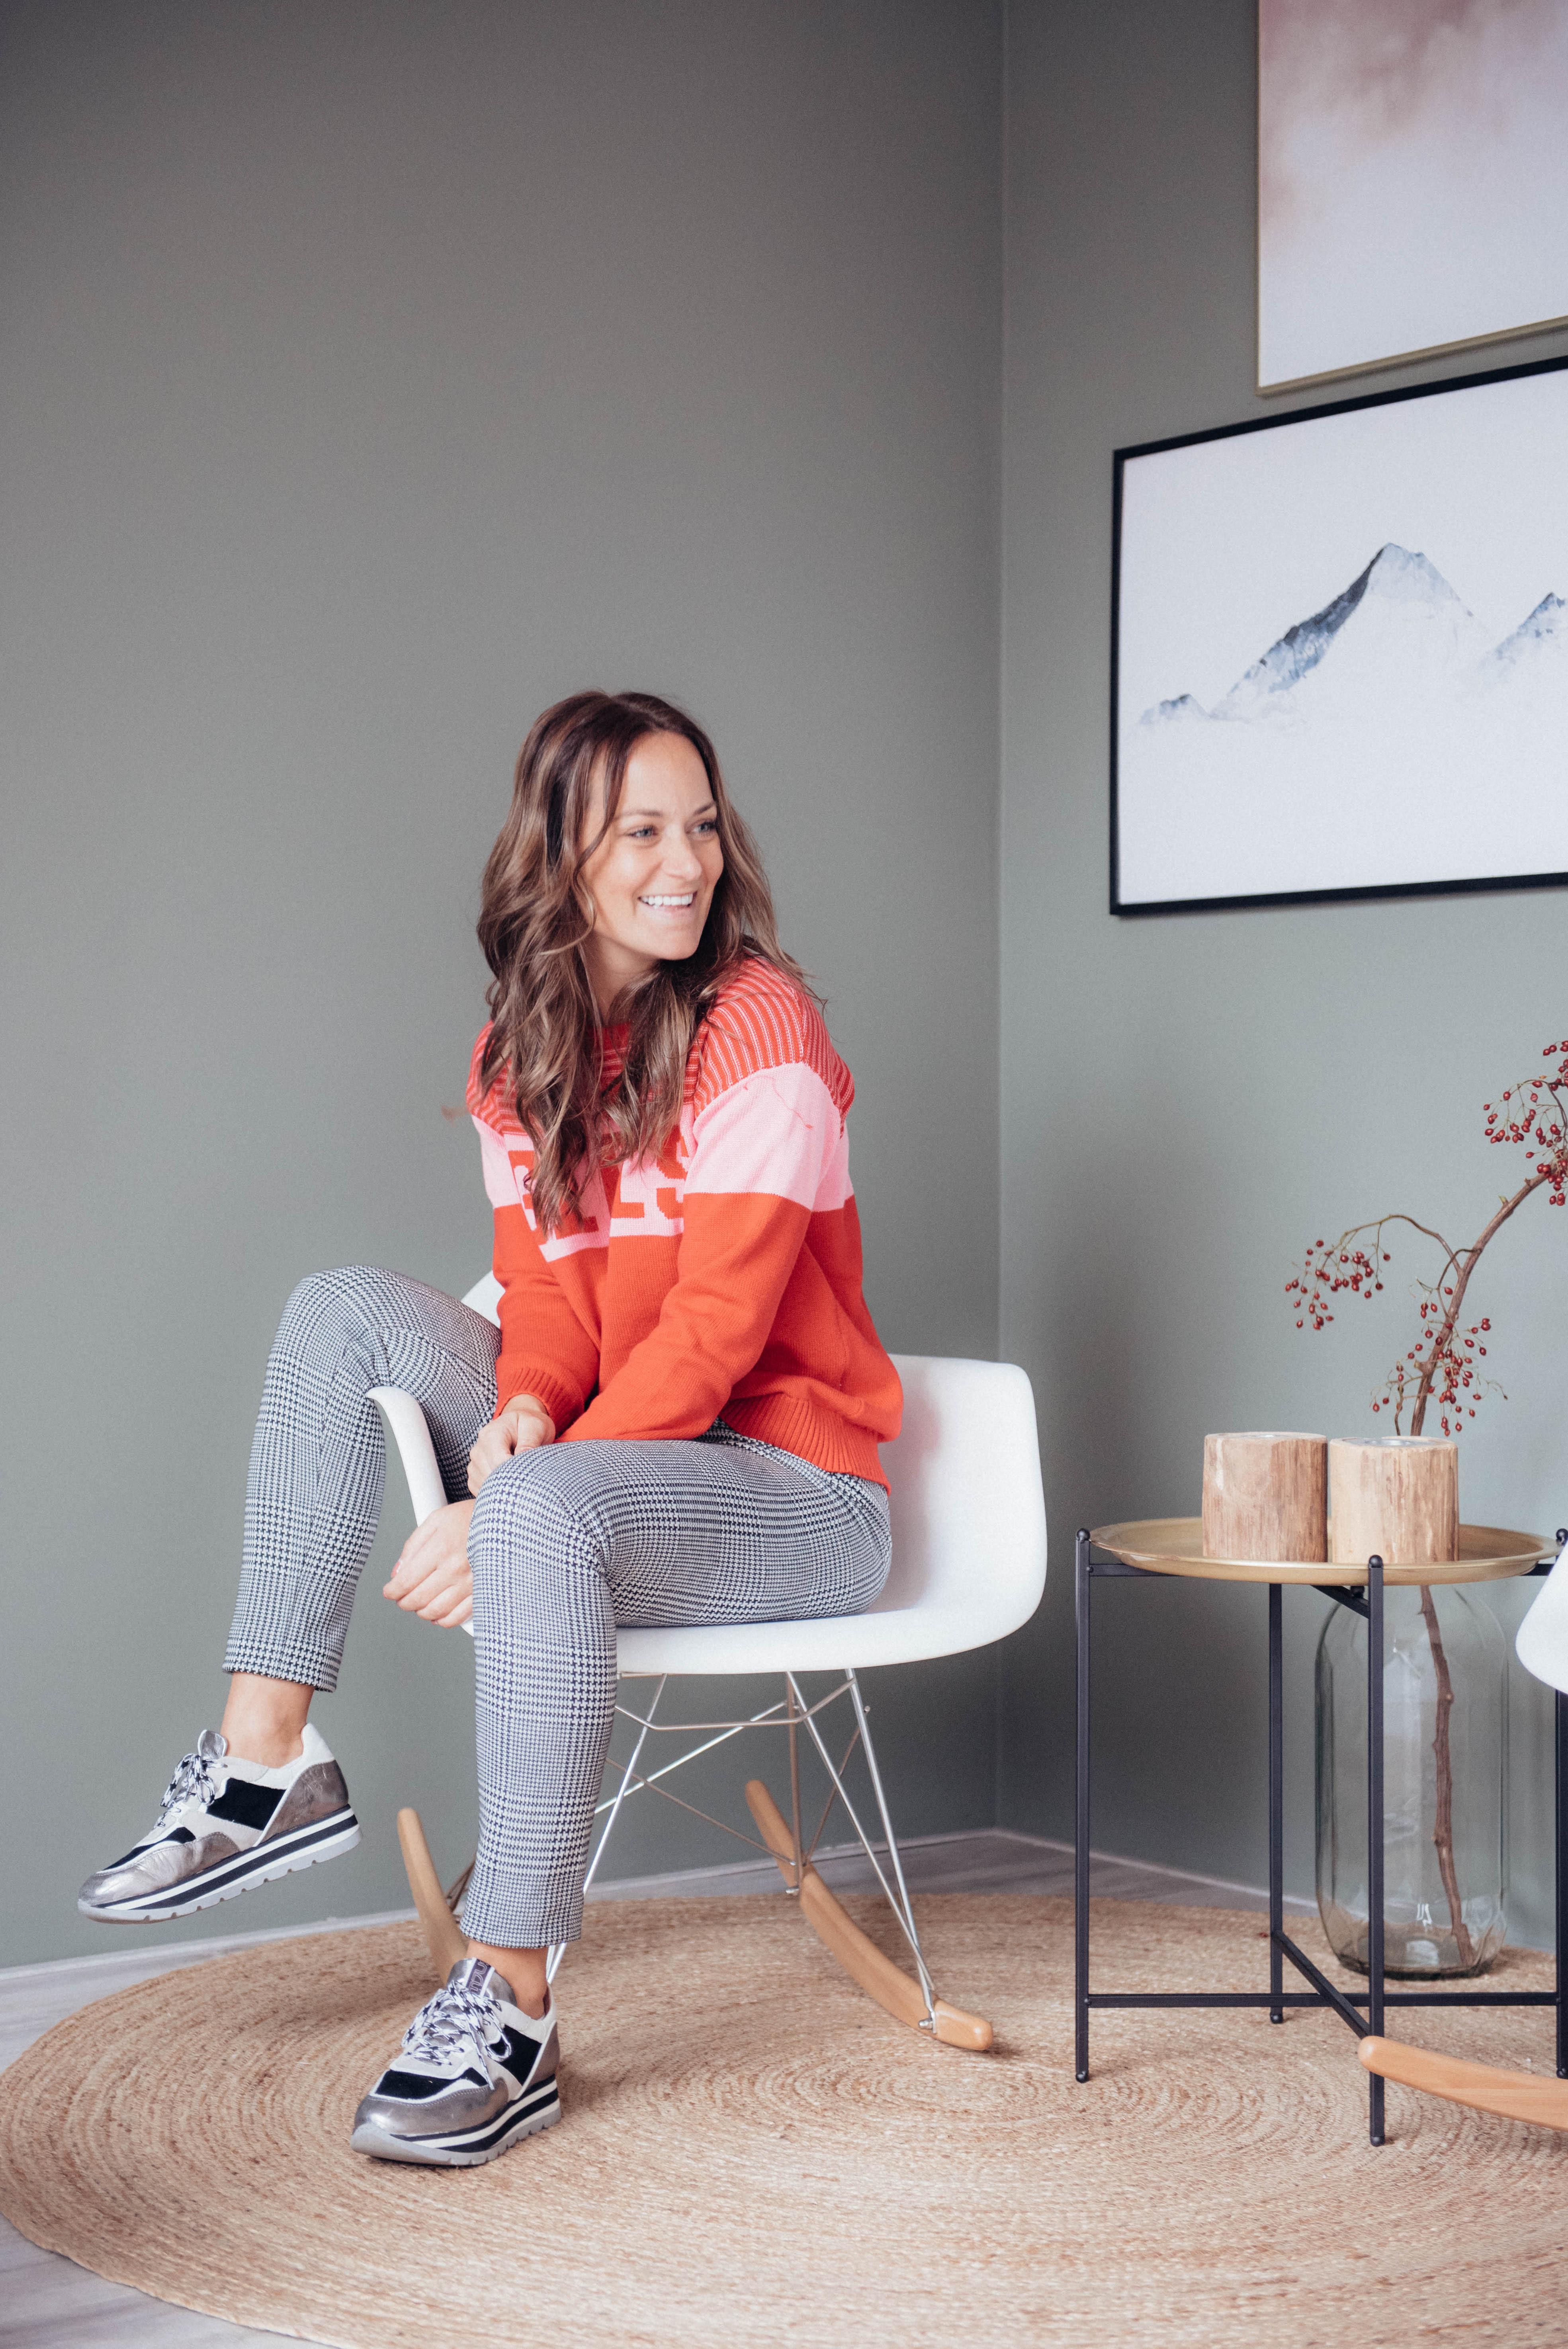 xmariekie. blog, blogger, interieur, huis. stoel, schommelstoel, relaxen, relax, desenio, vloerkledenloods, designerchairs24, designer